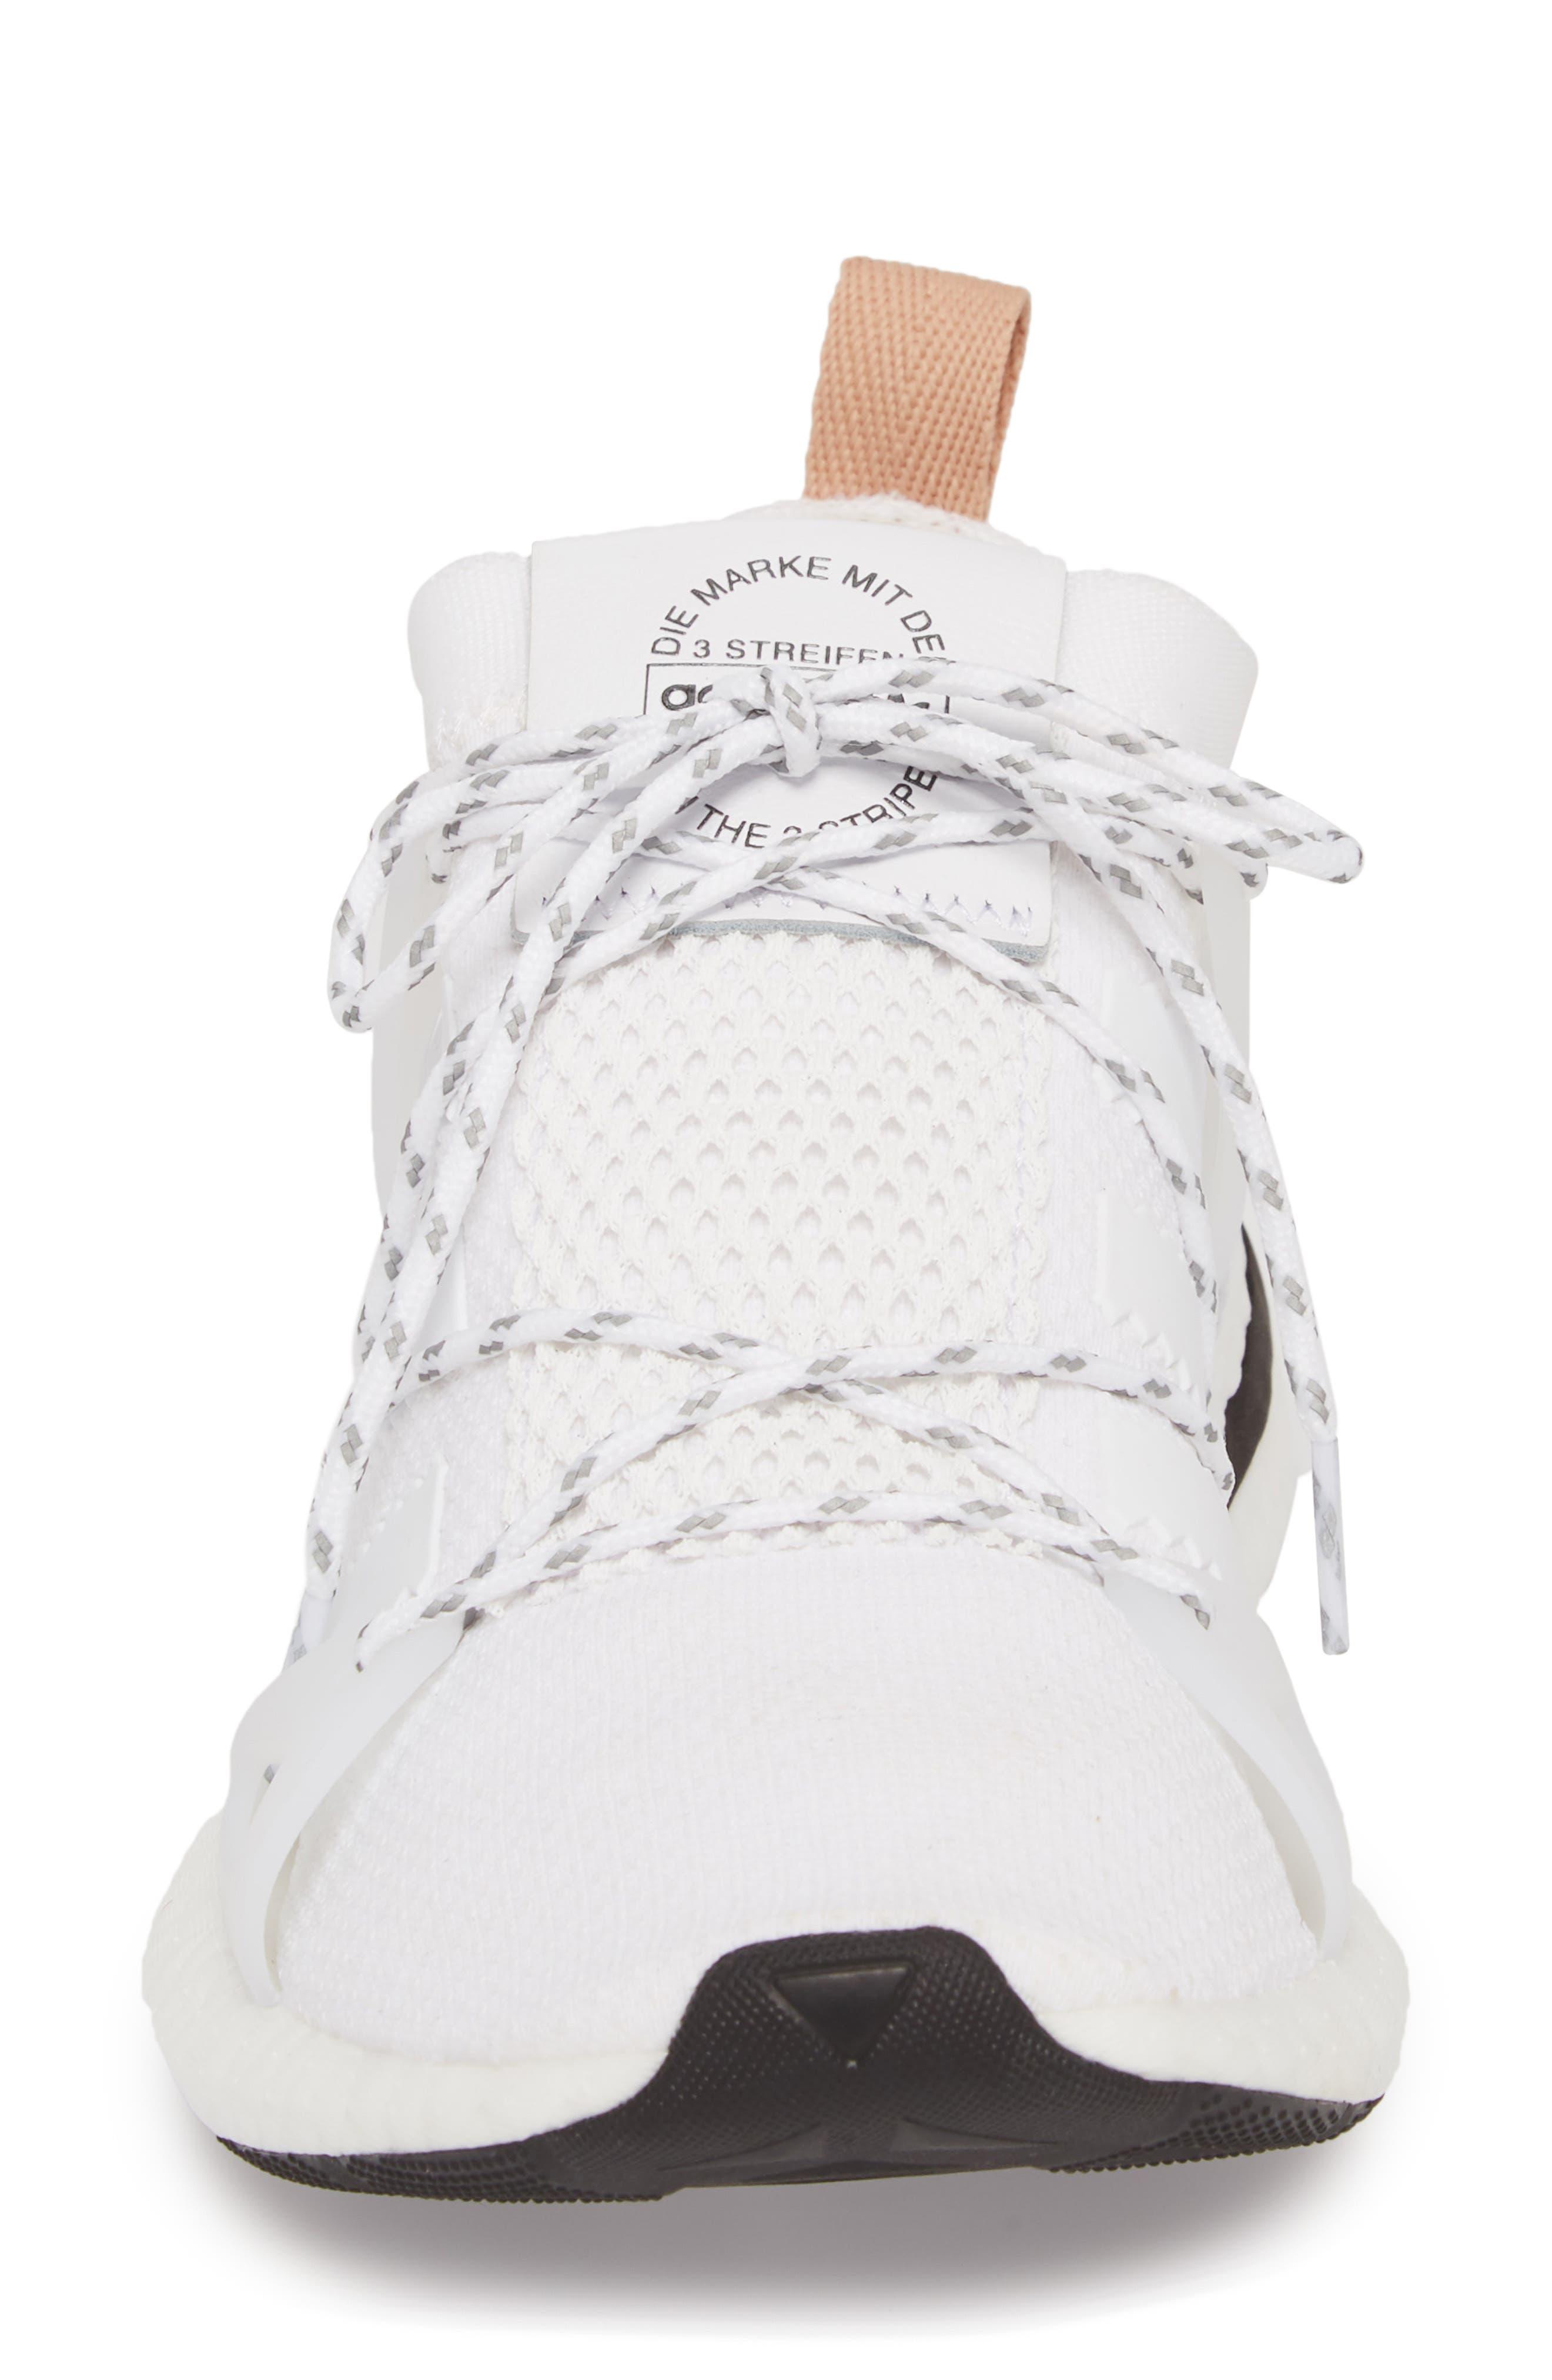 Arkyn Sneaker,                             Alternate thumbnail 4, color,                             White/ White/ Ash Pearl